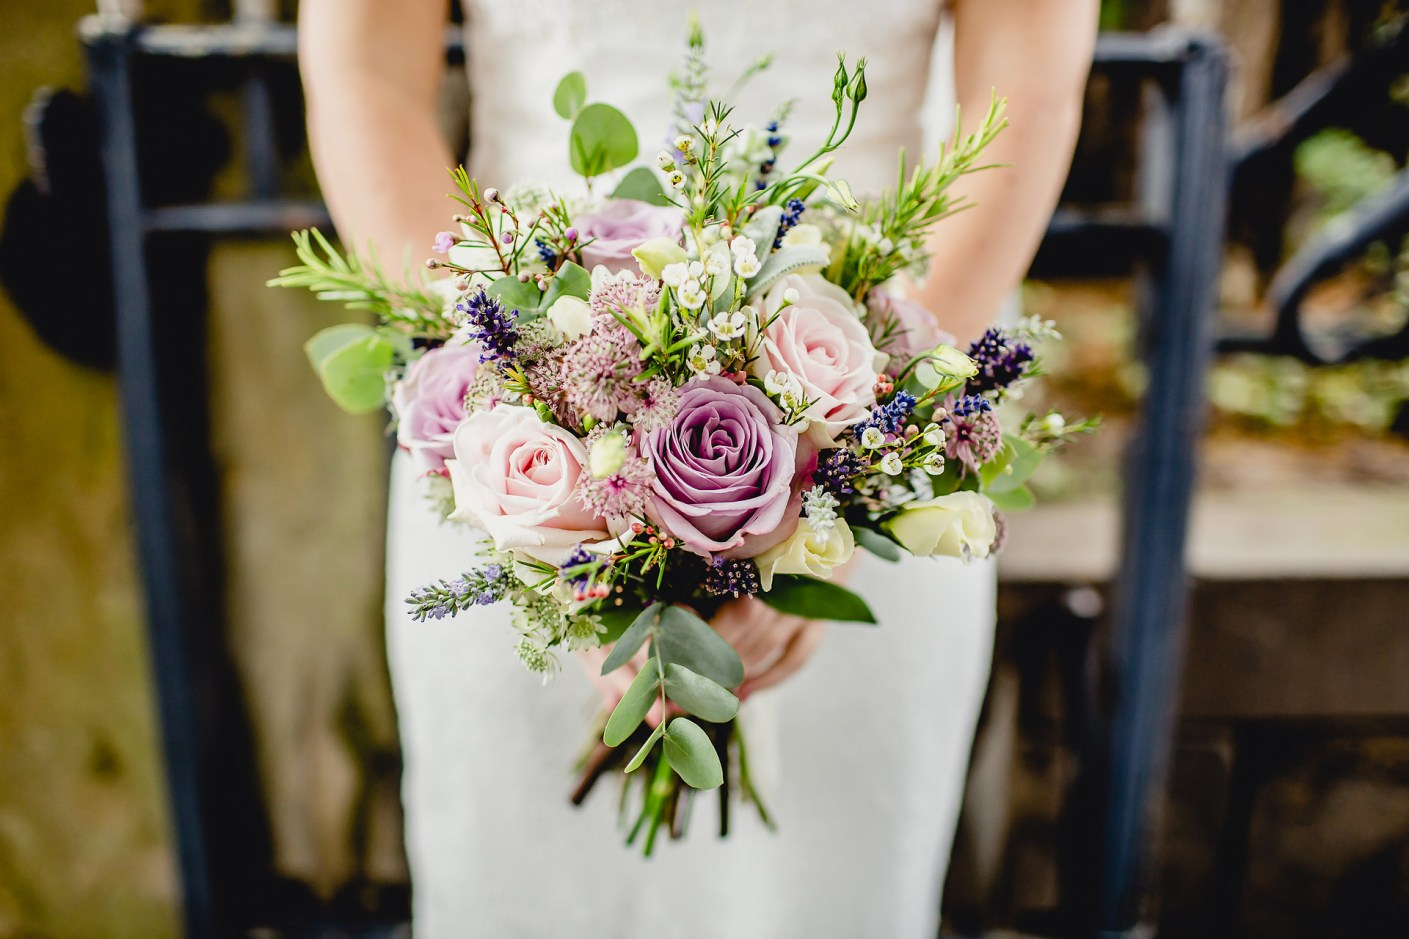 boquet for the bride